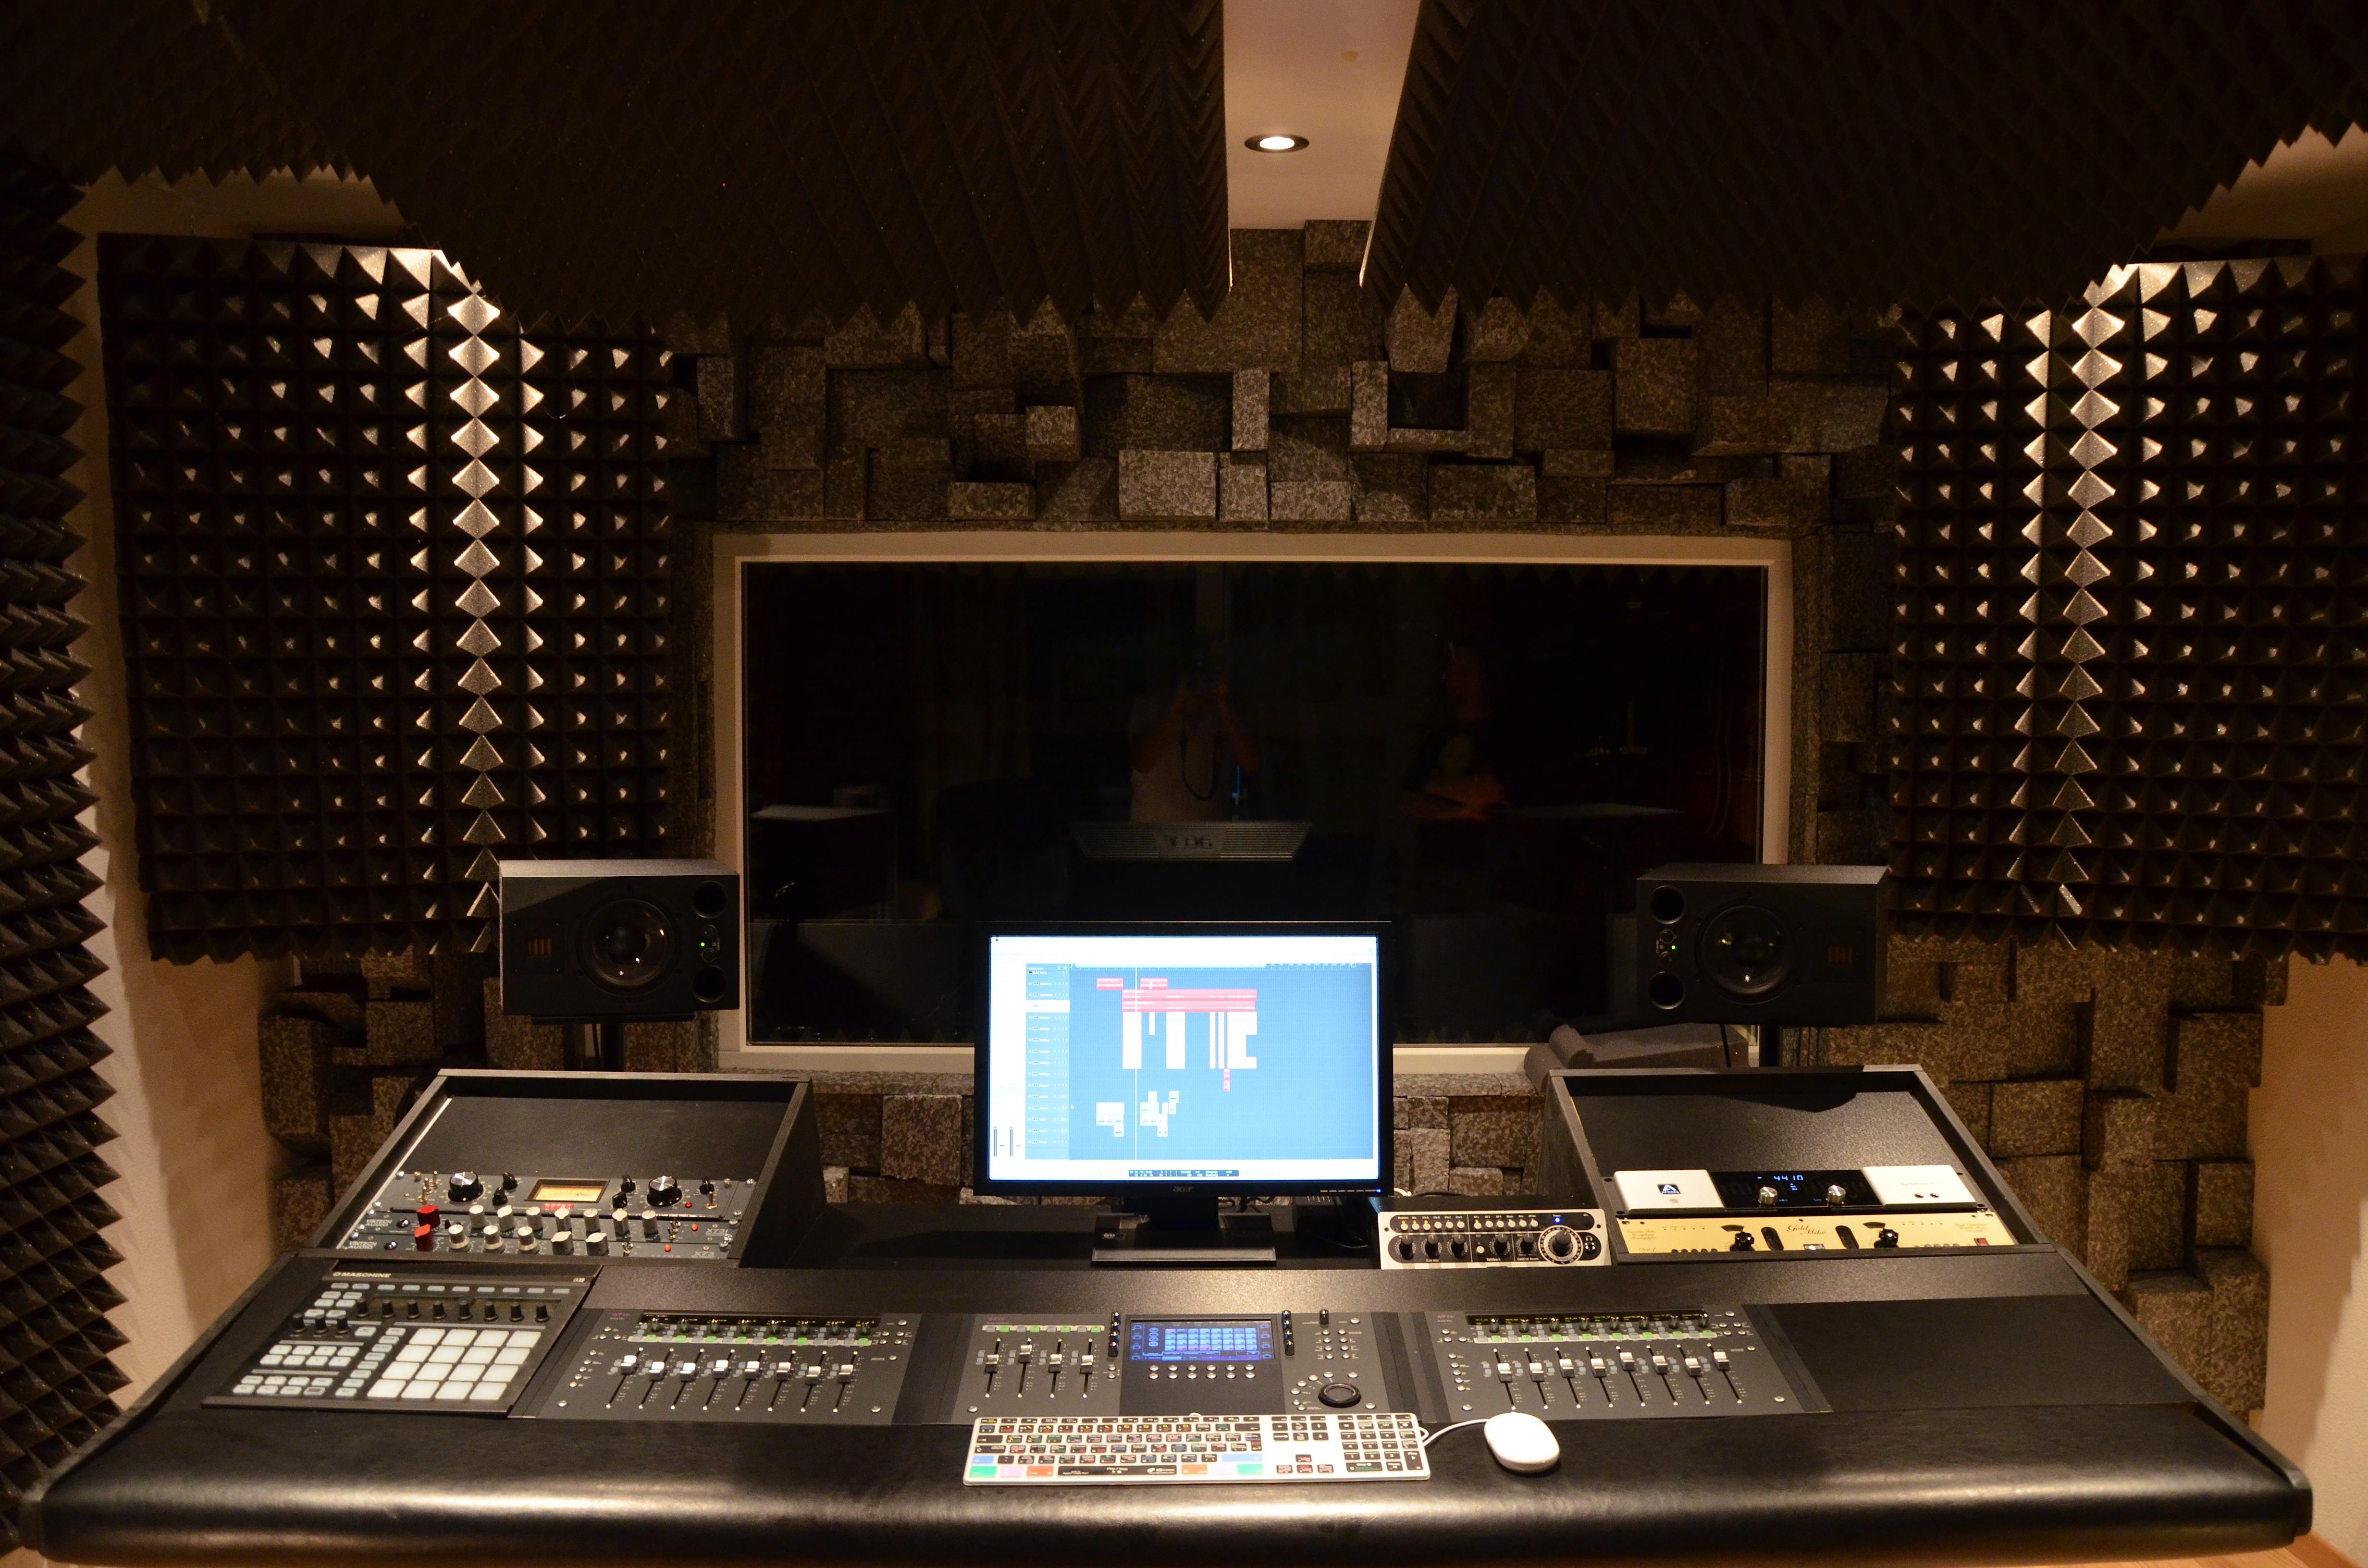 Dsc 1154 Jpg Finally Building My New Studio Desk 1168